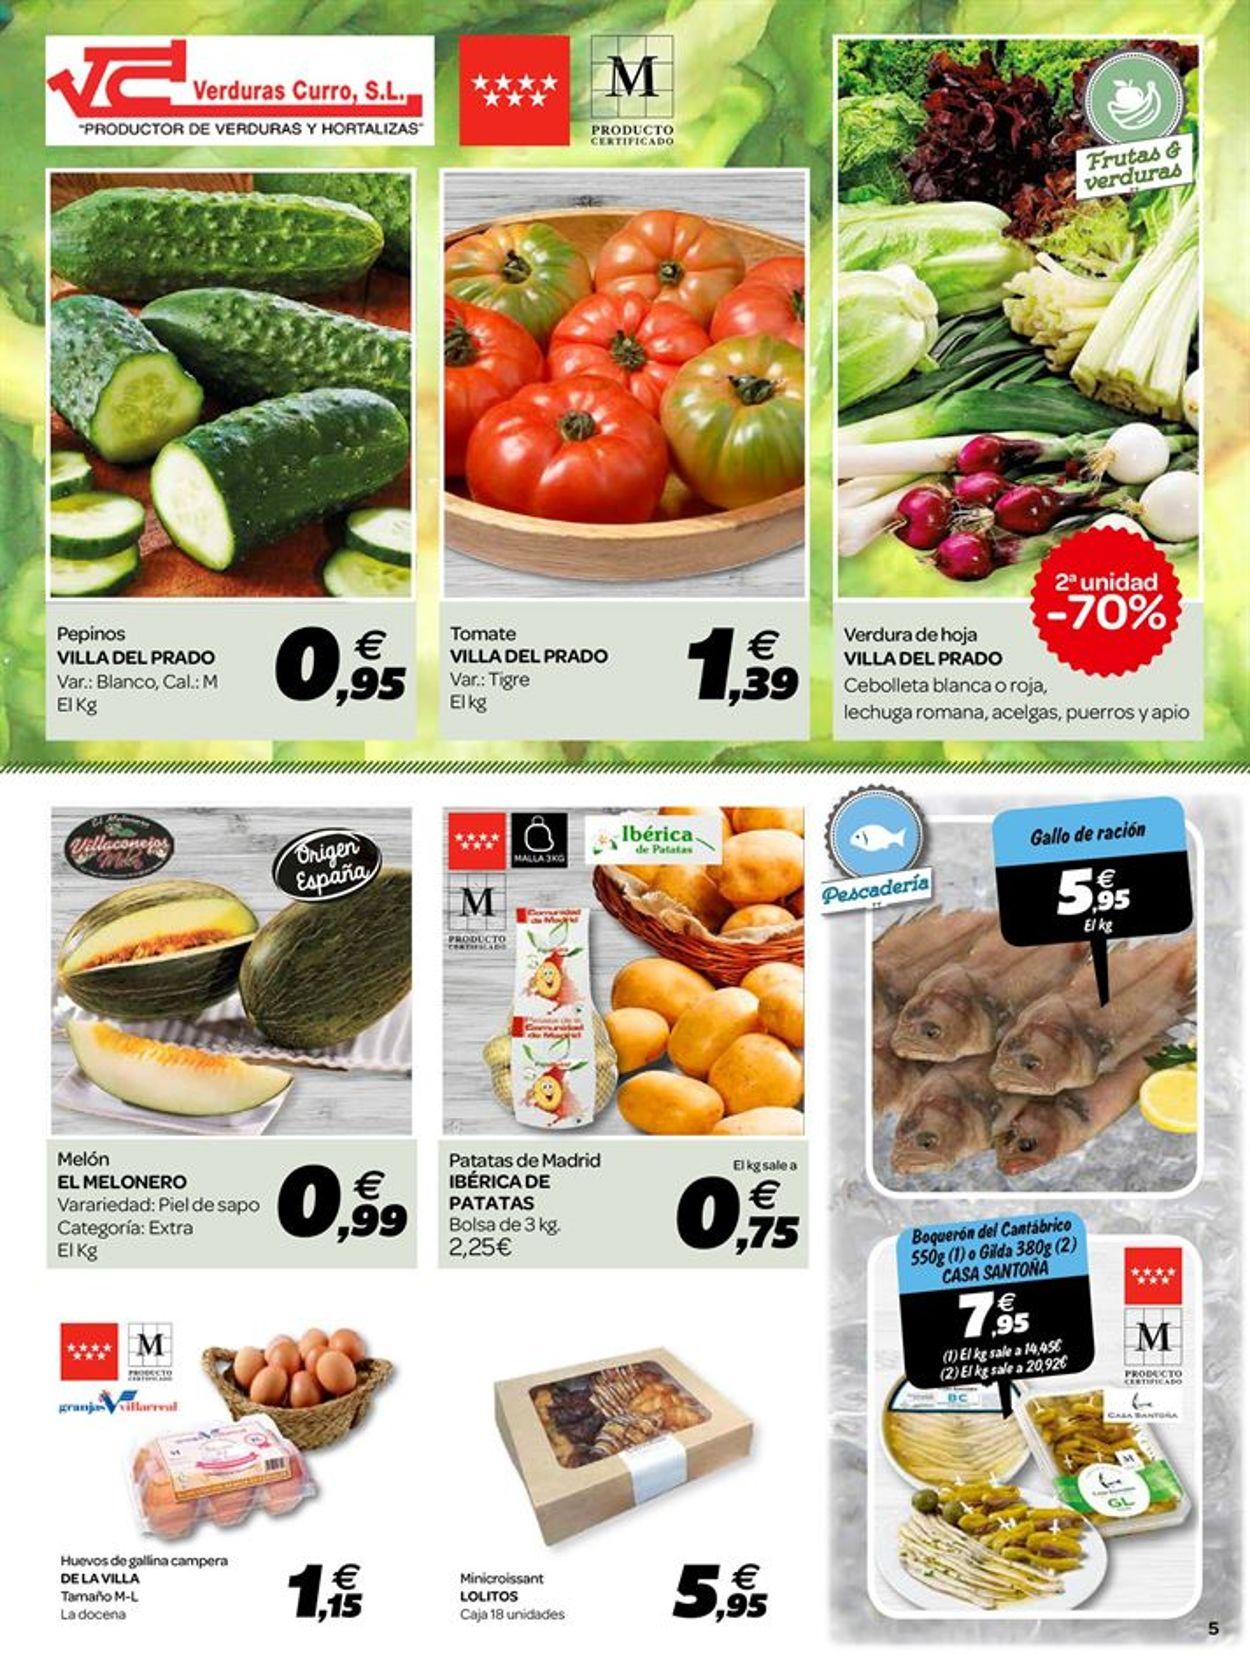 Carrefour Folleto - 10.07-24.07.2019 (Página 5)